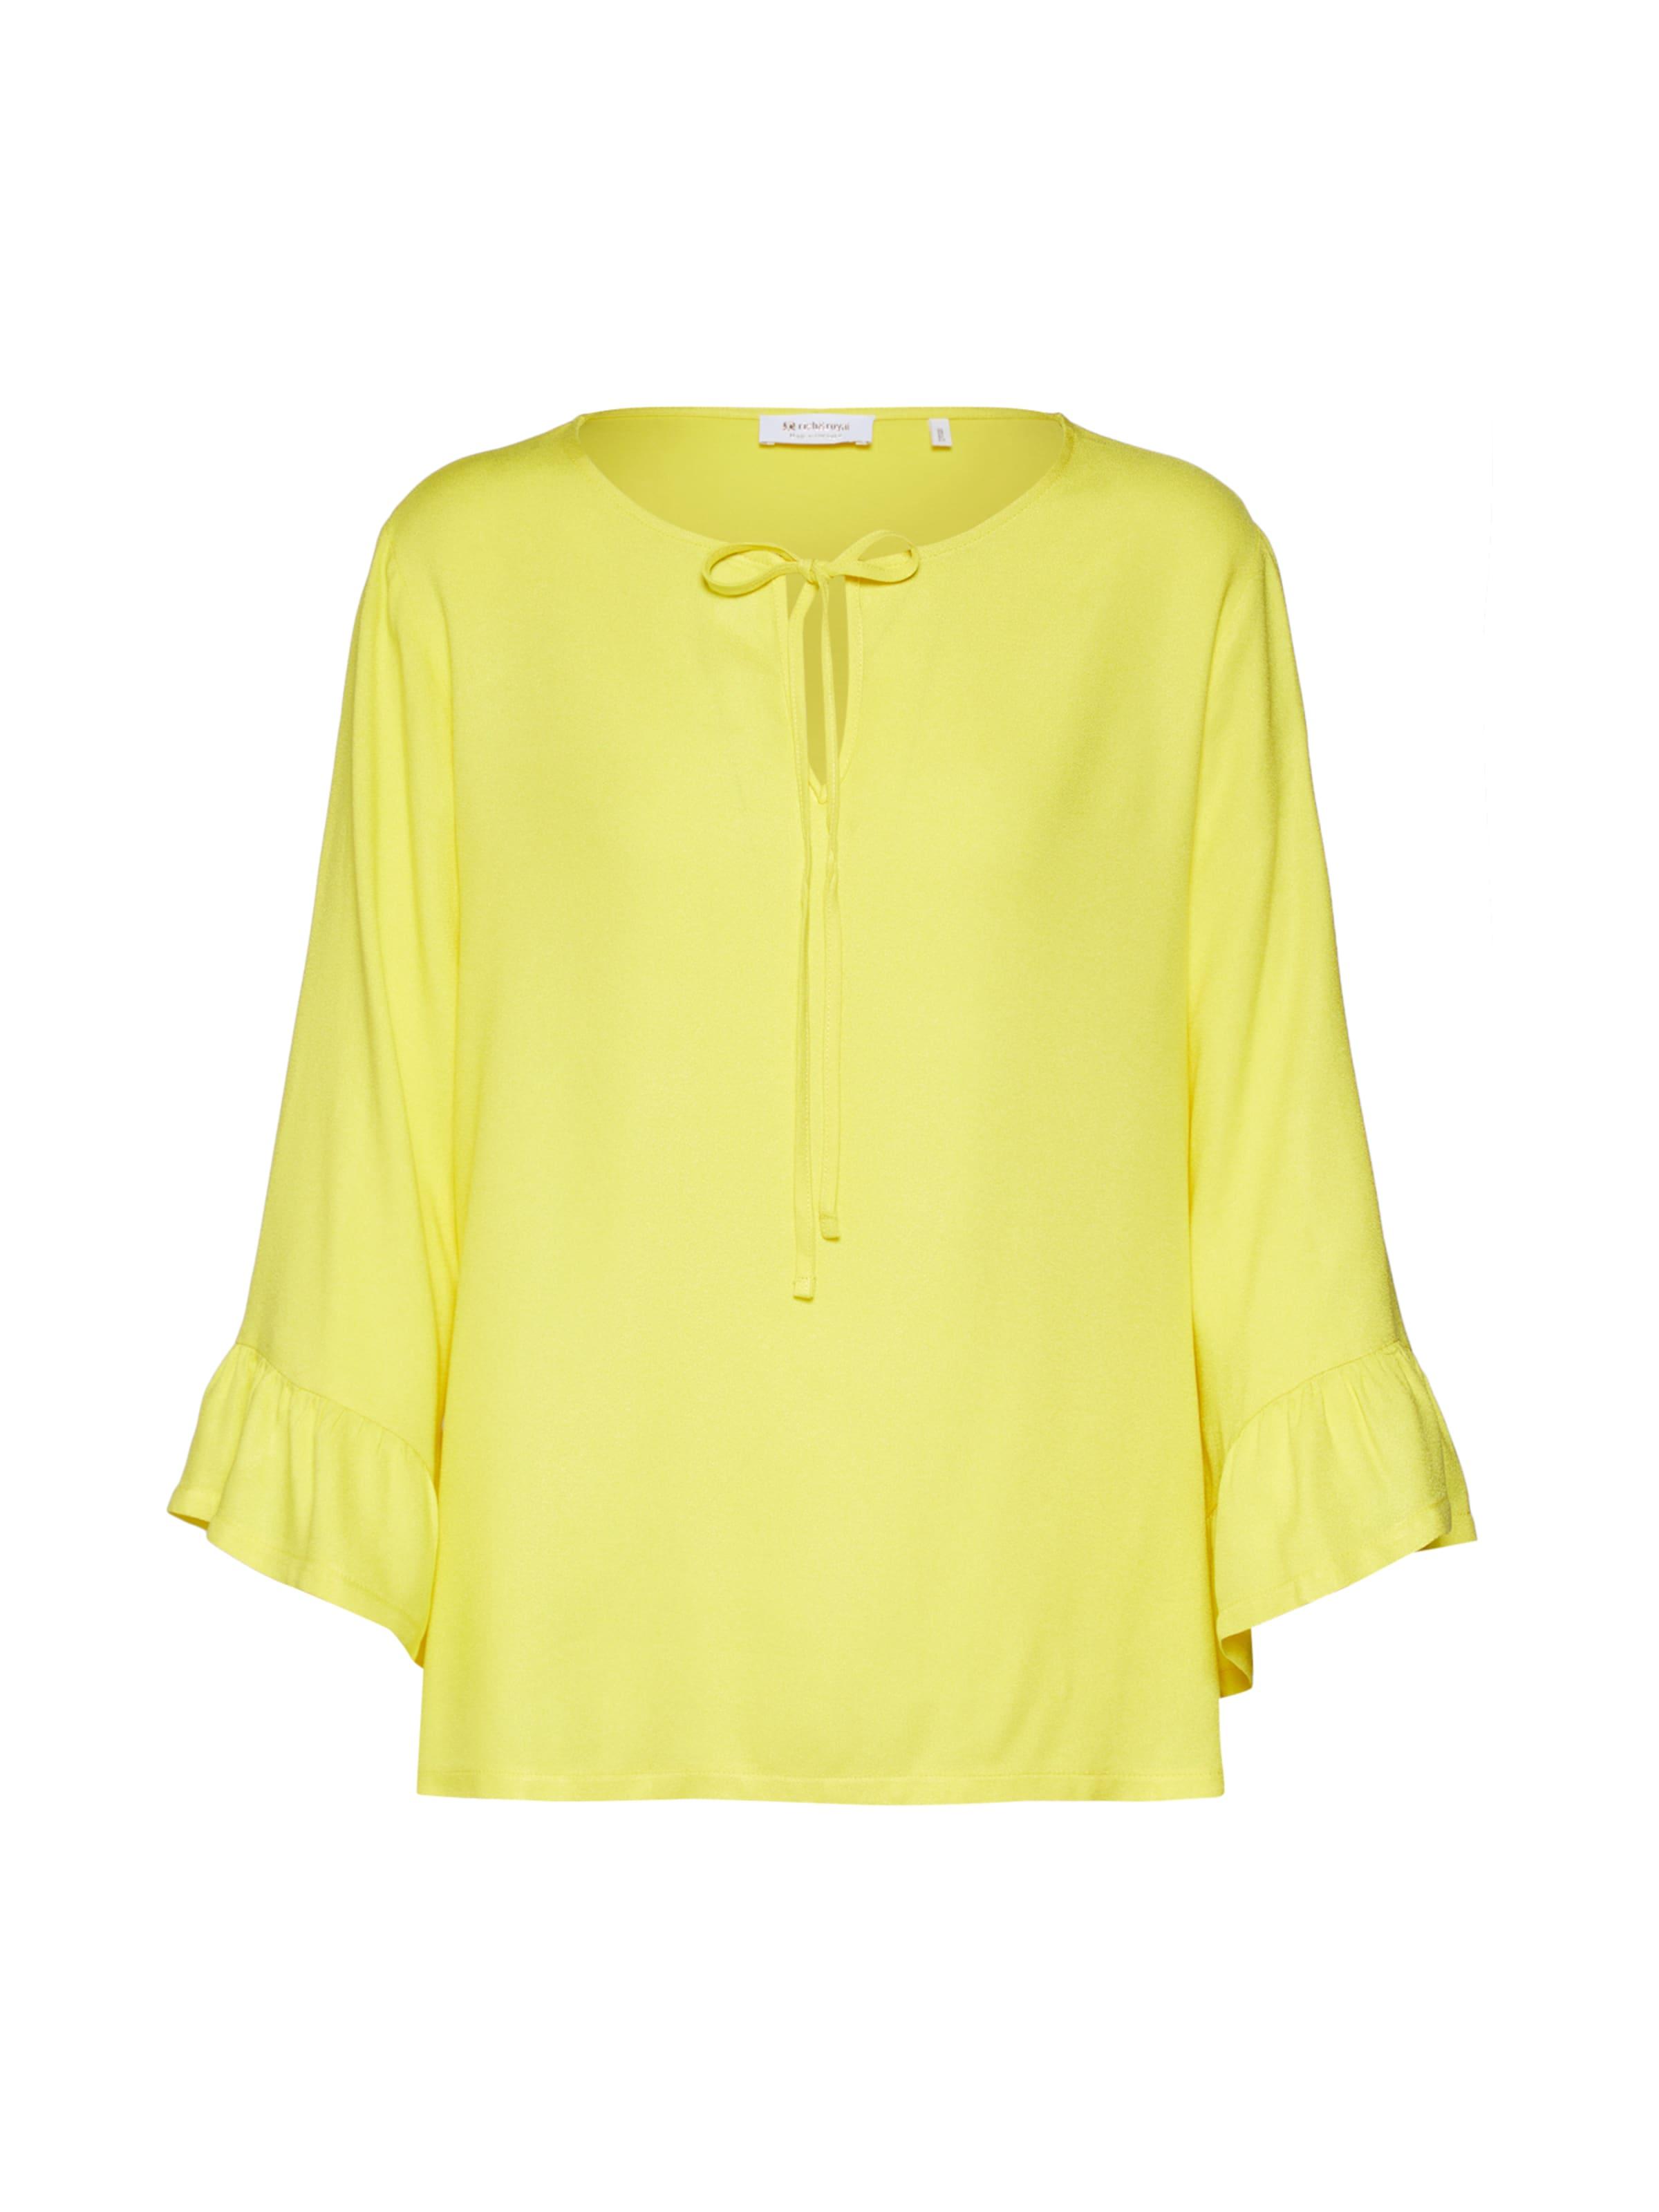 Royal Royal Gelb Royal Bluse In Bluse Bluse Richamp; In Richamp; Gelb Richamp; In 8nyP0wvmNO